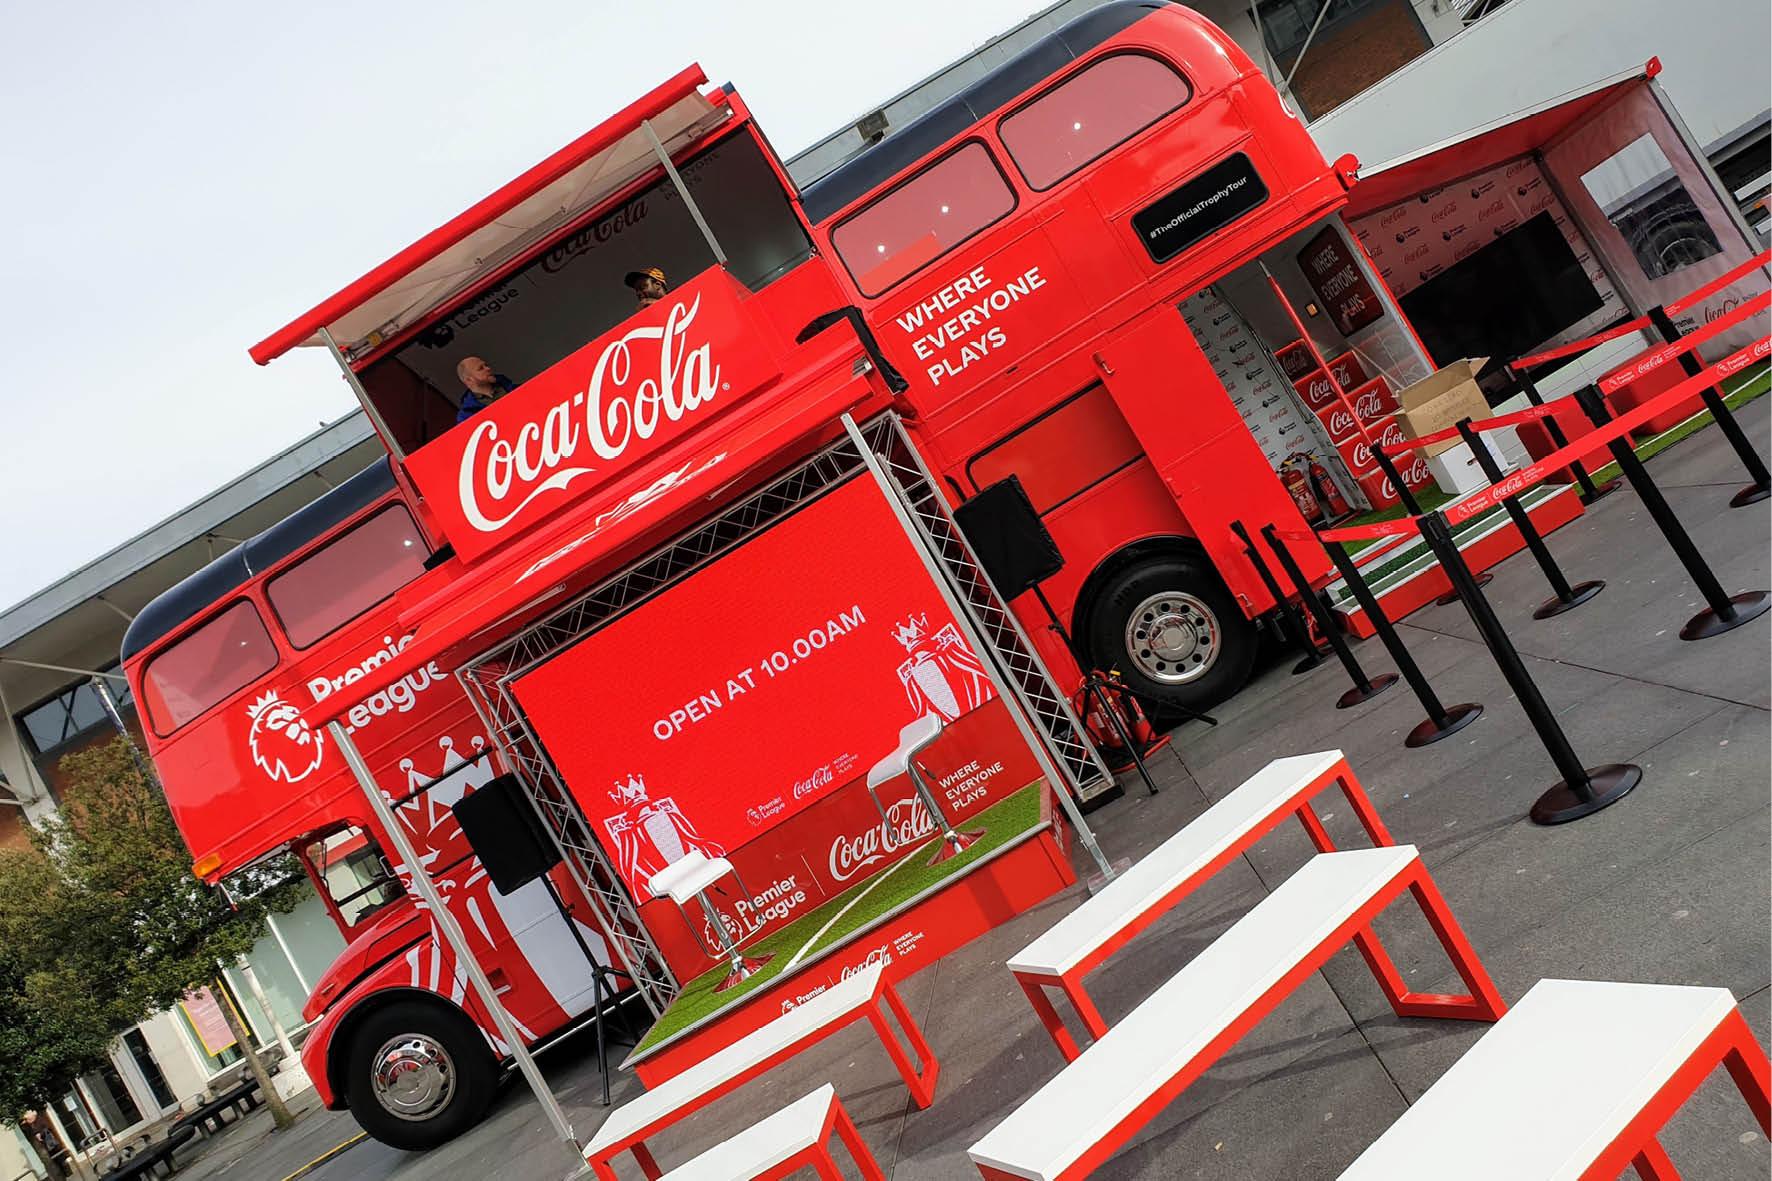 bus_business_2019_coca_cola_9.jpg